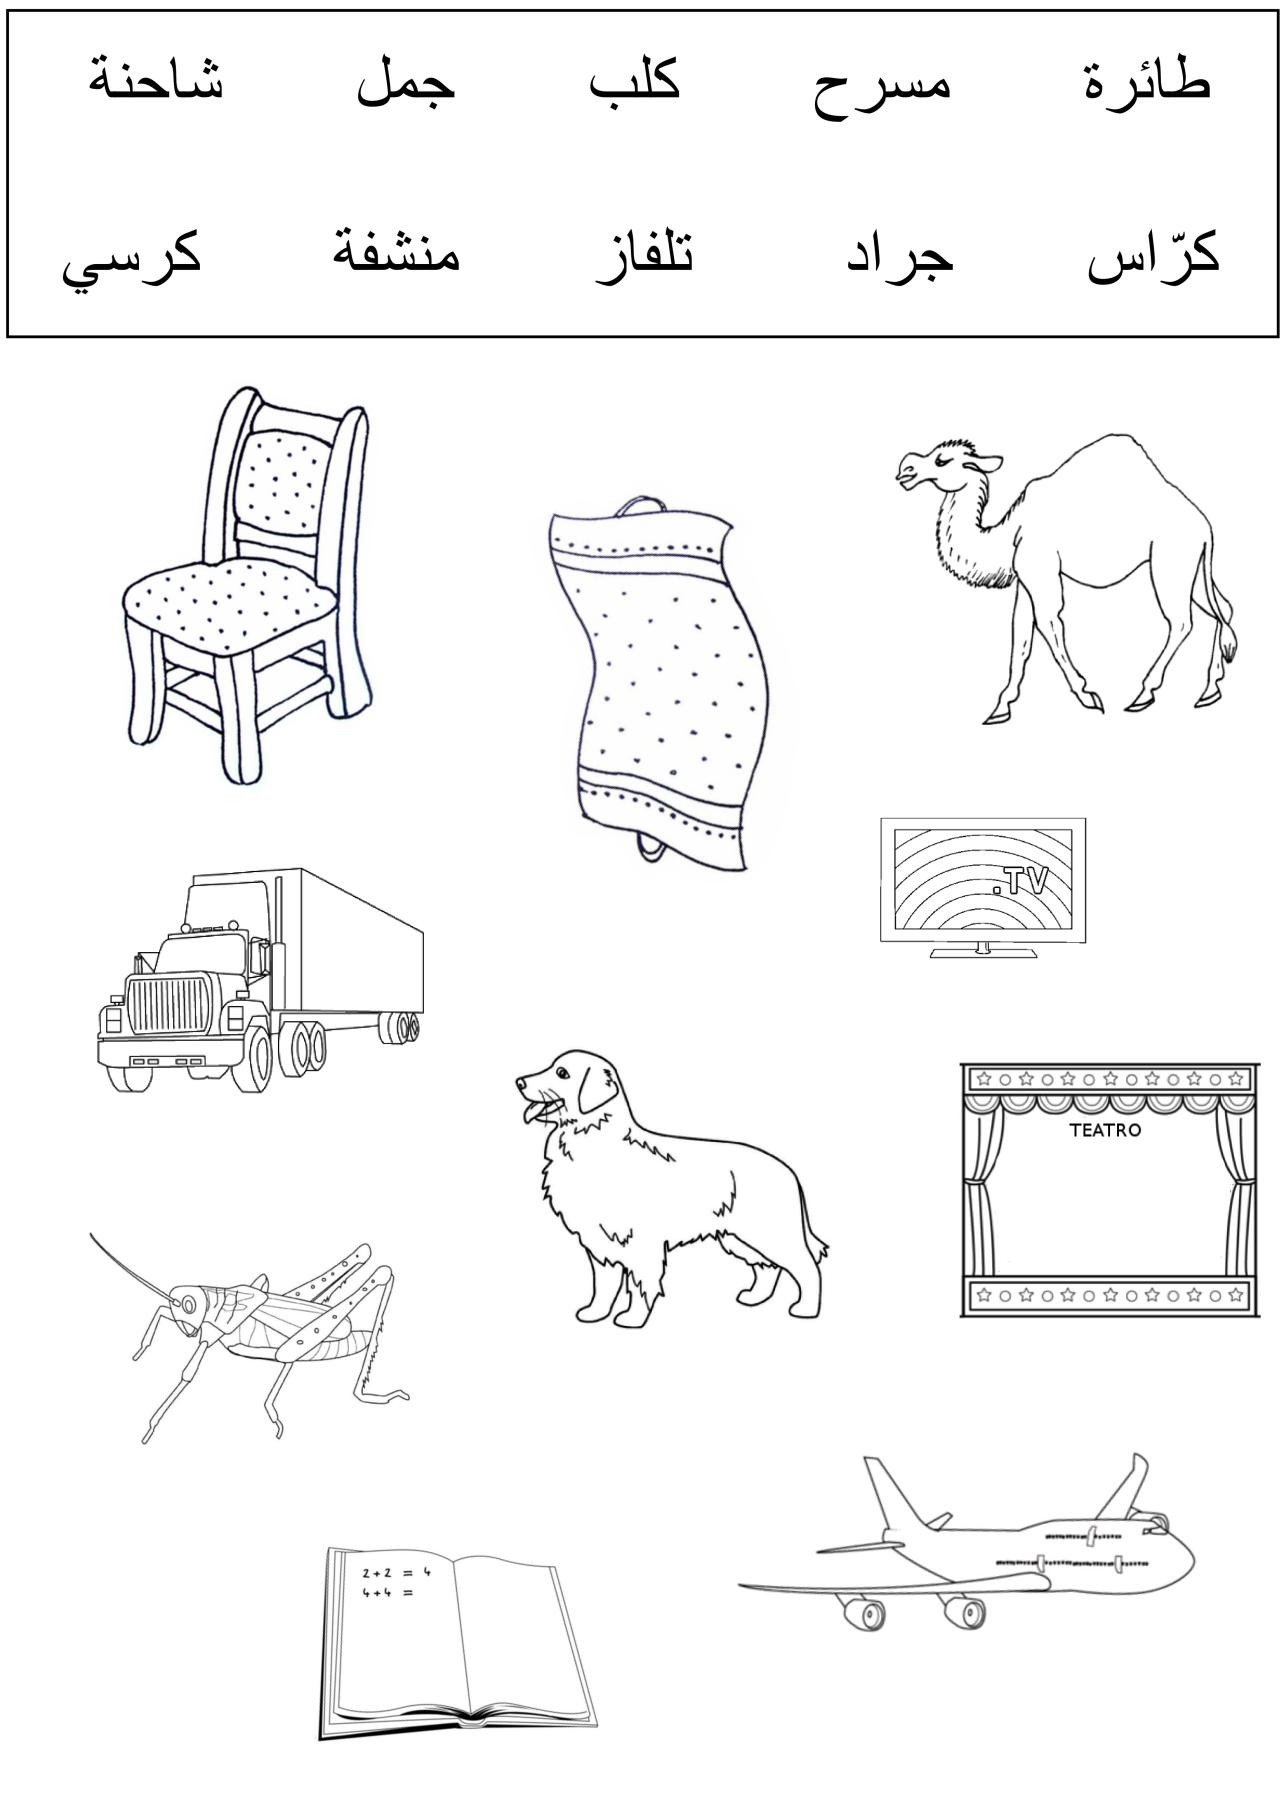 Ejercicio Vocabulario 3 Learnarabicworksheets Arabic Alphabet For Kids Learn Arabic Online Arabic Kids